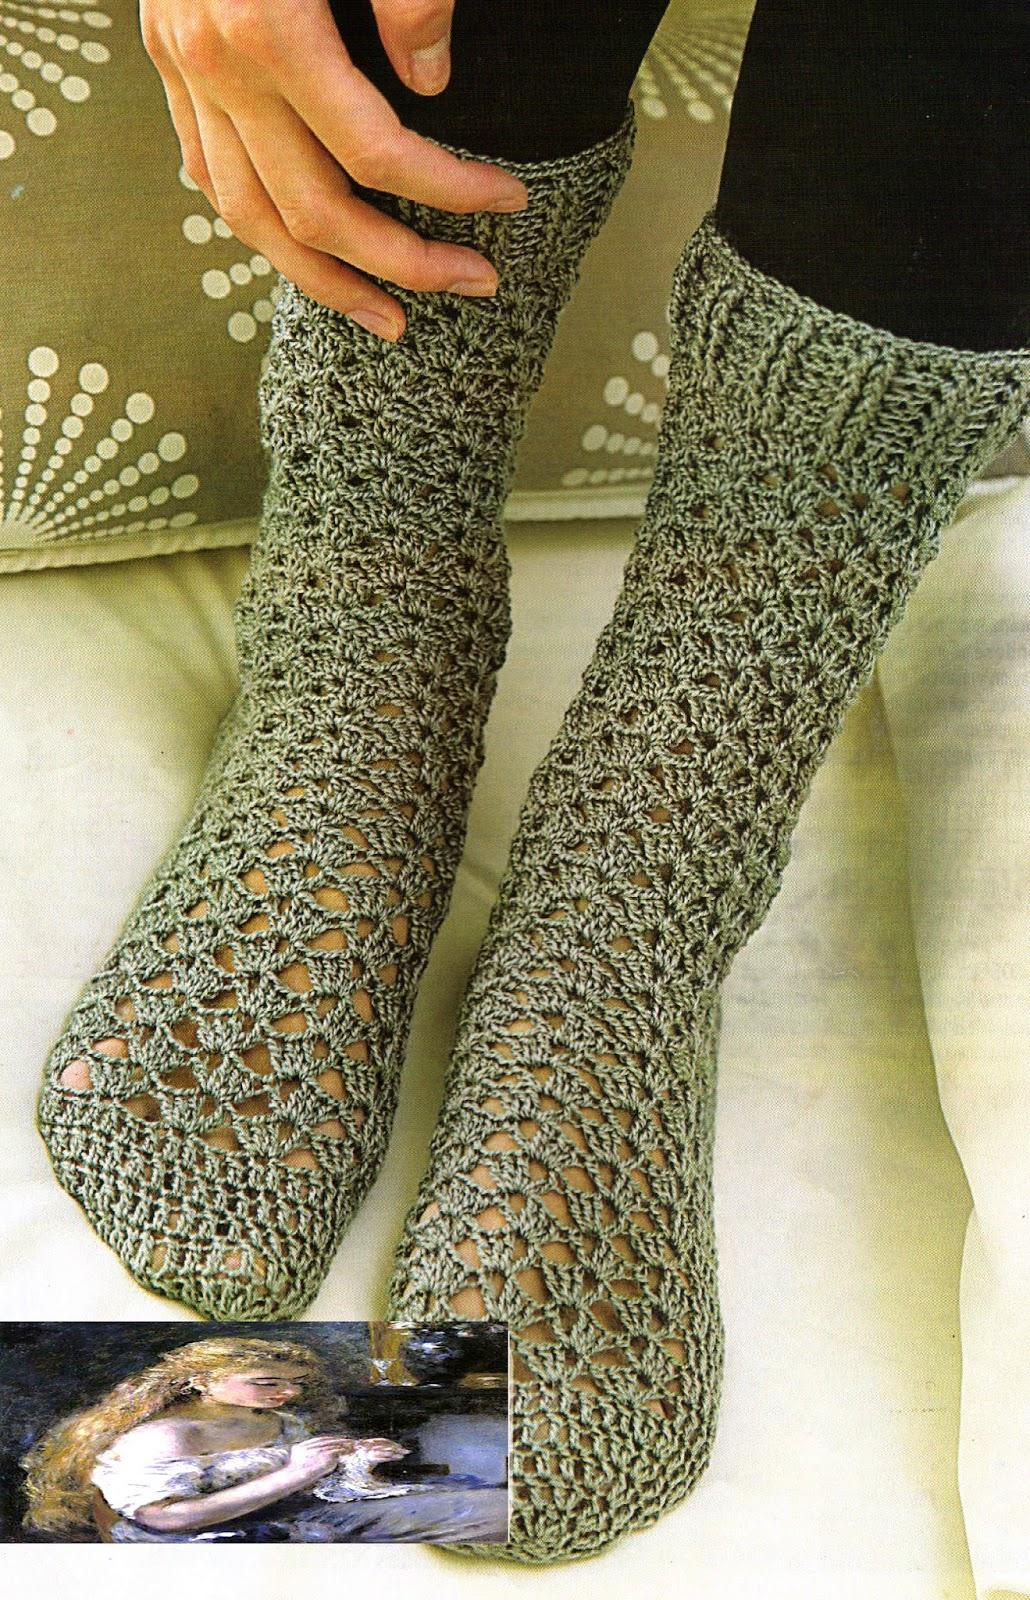 tejidos artesanales en crochet medias tejidas en crochet. Black Bedroom Furniture Sets. Home Design Ideas